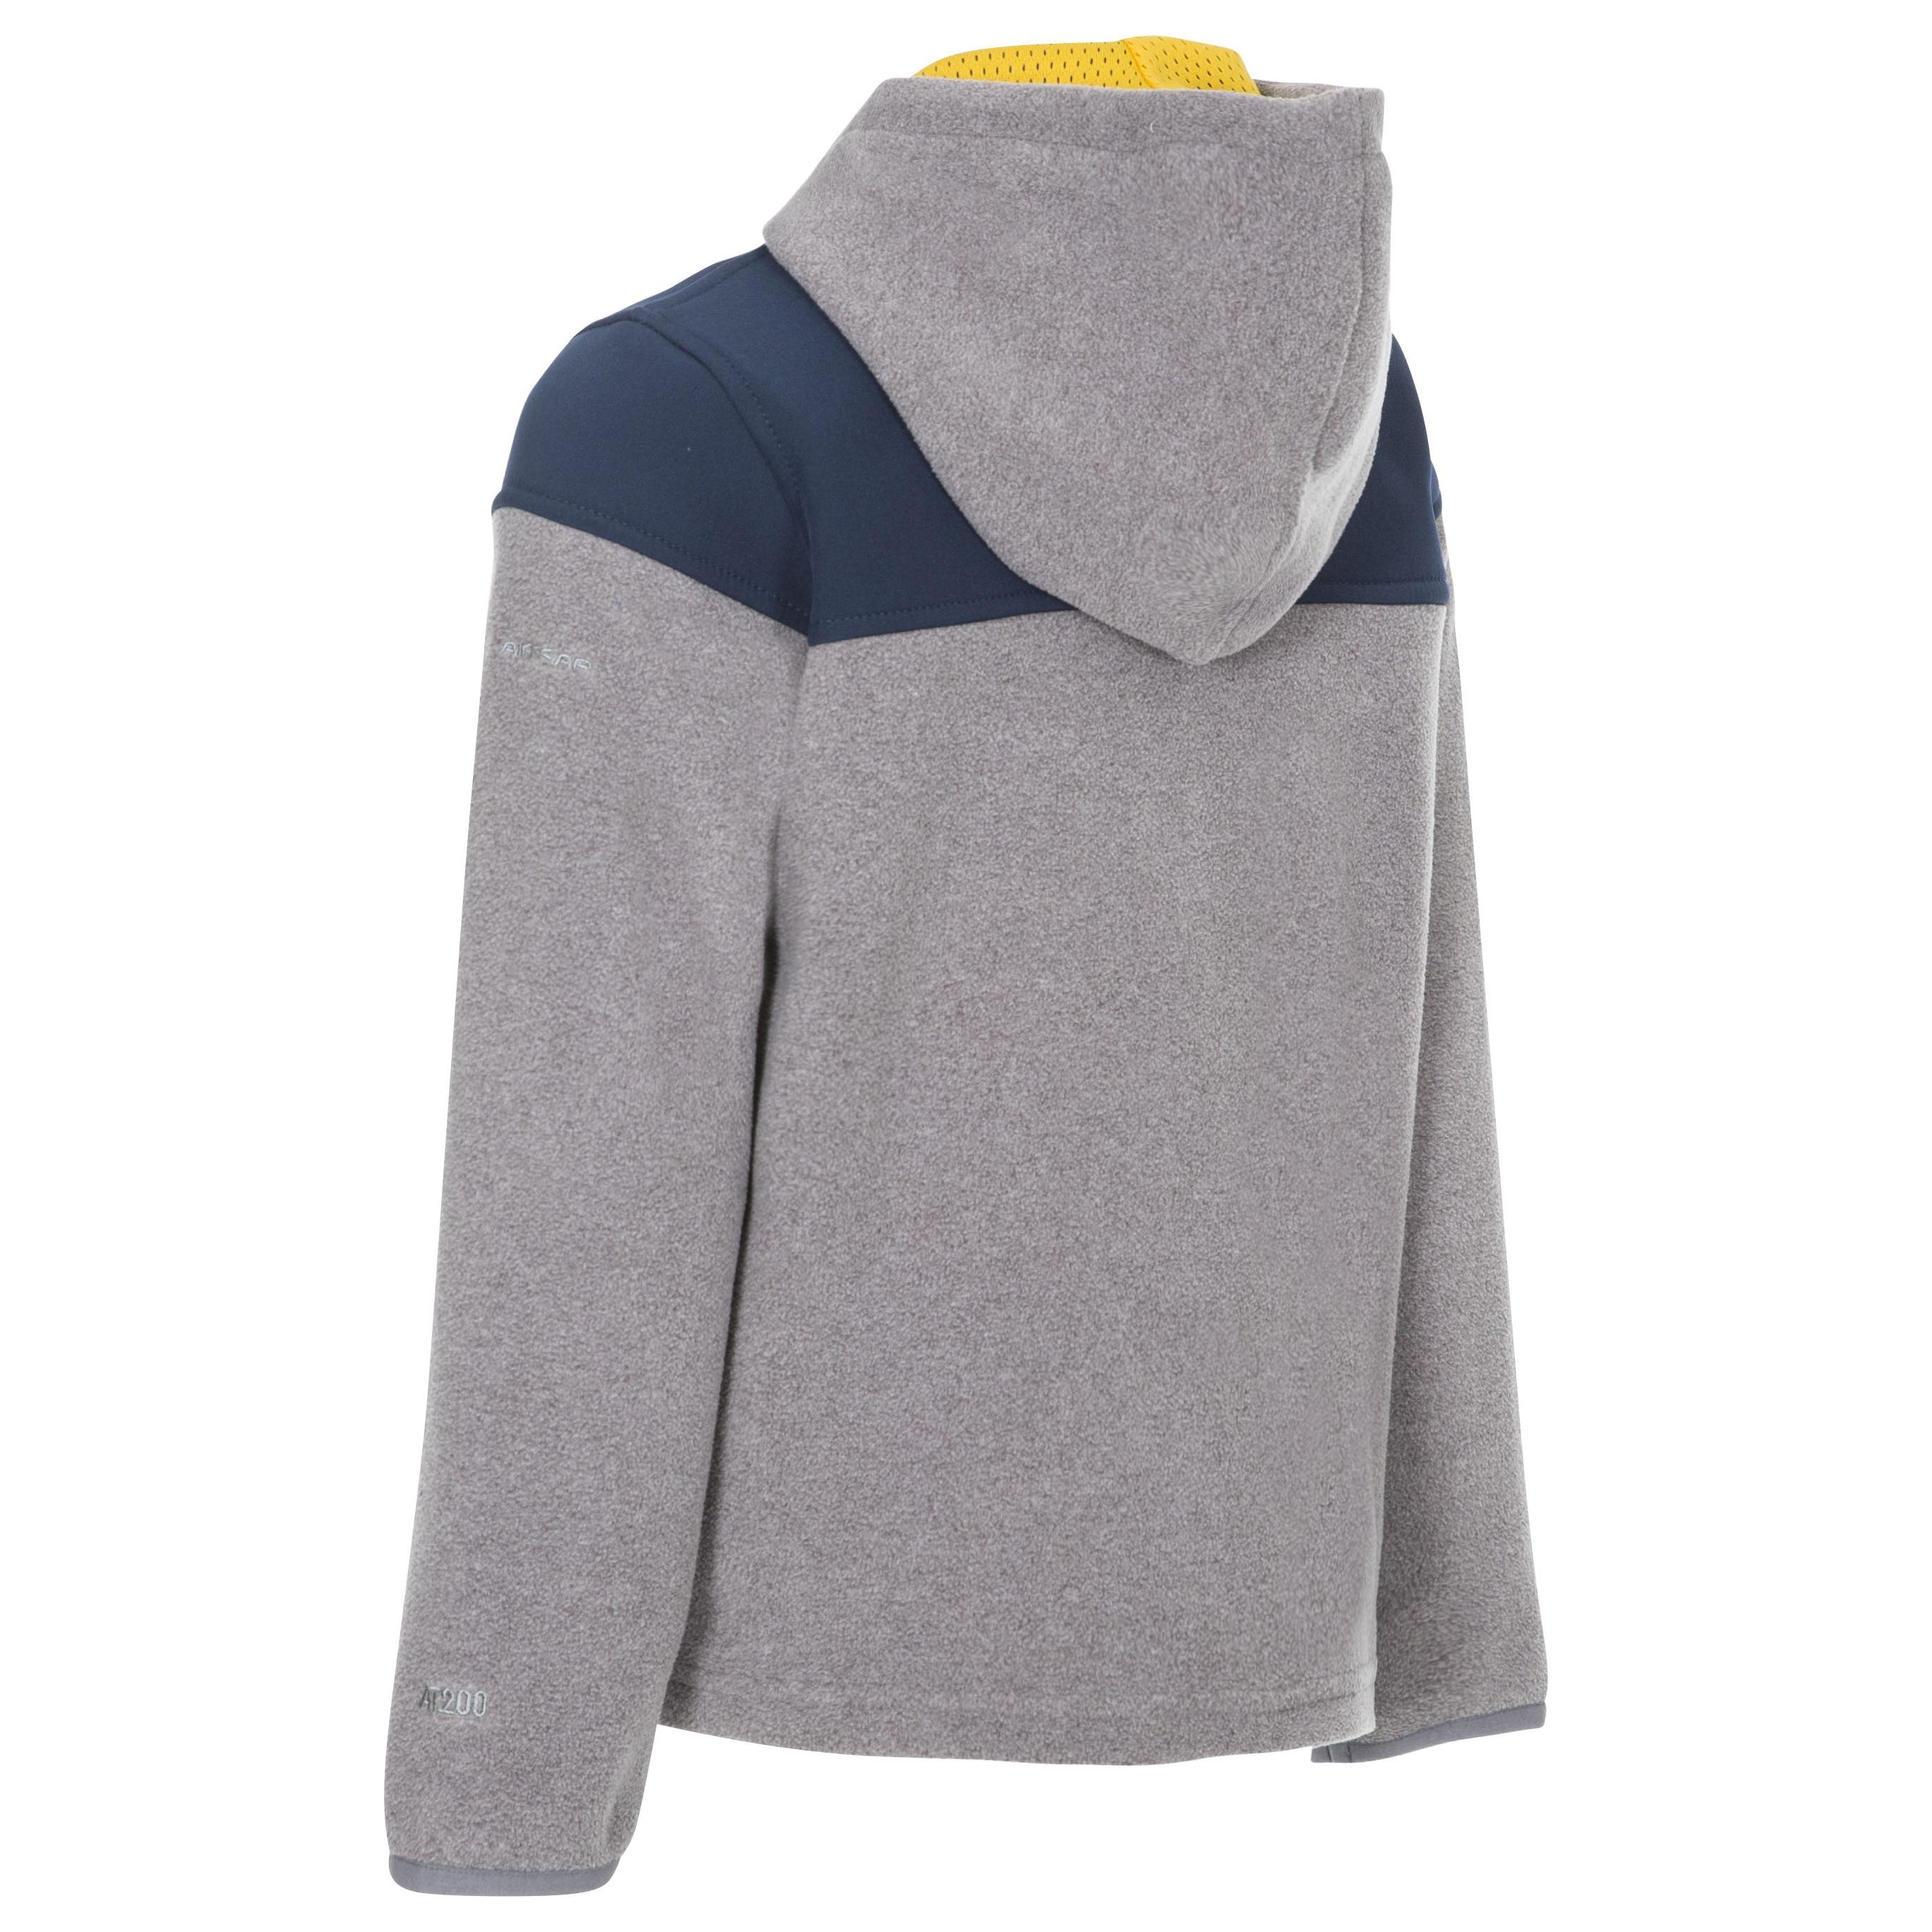 Trespass Boys Bieber Hooded Fleece Jacket (7-8 Years) (Red)